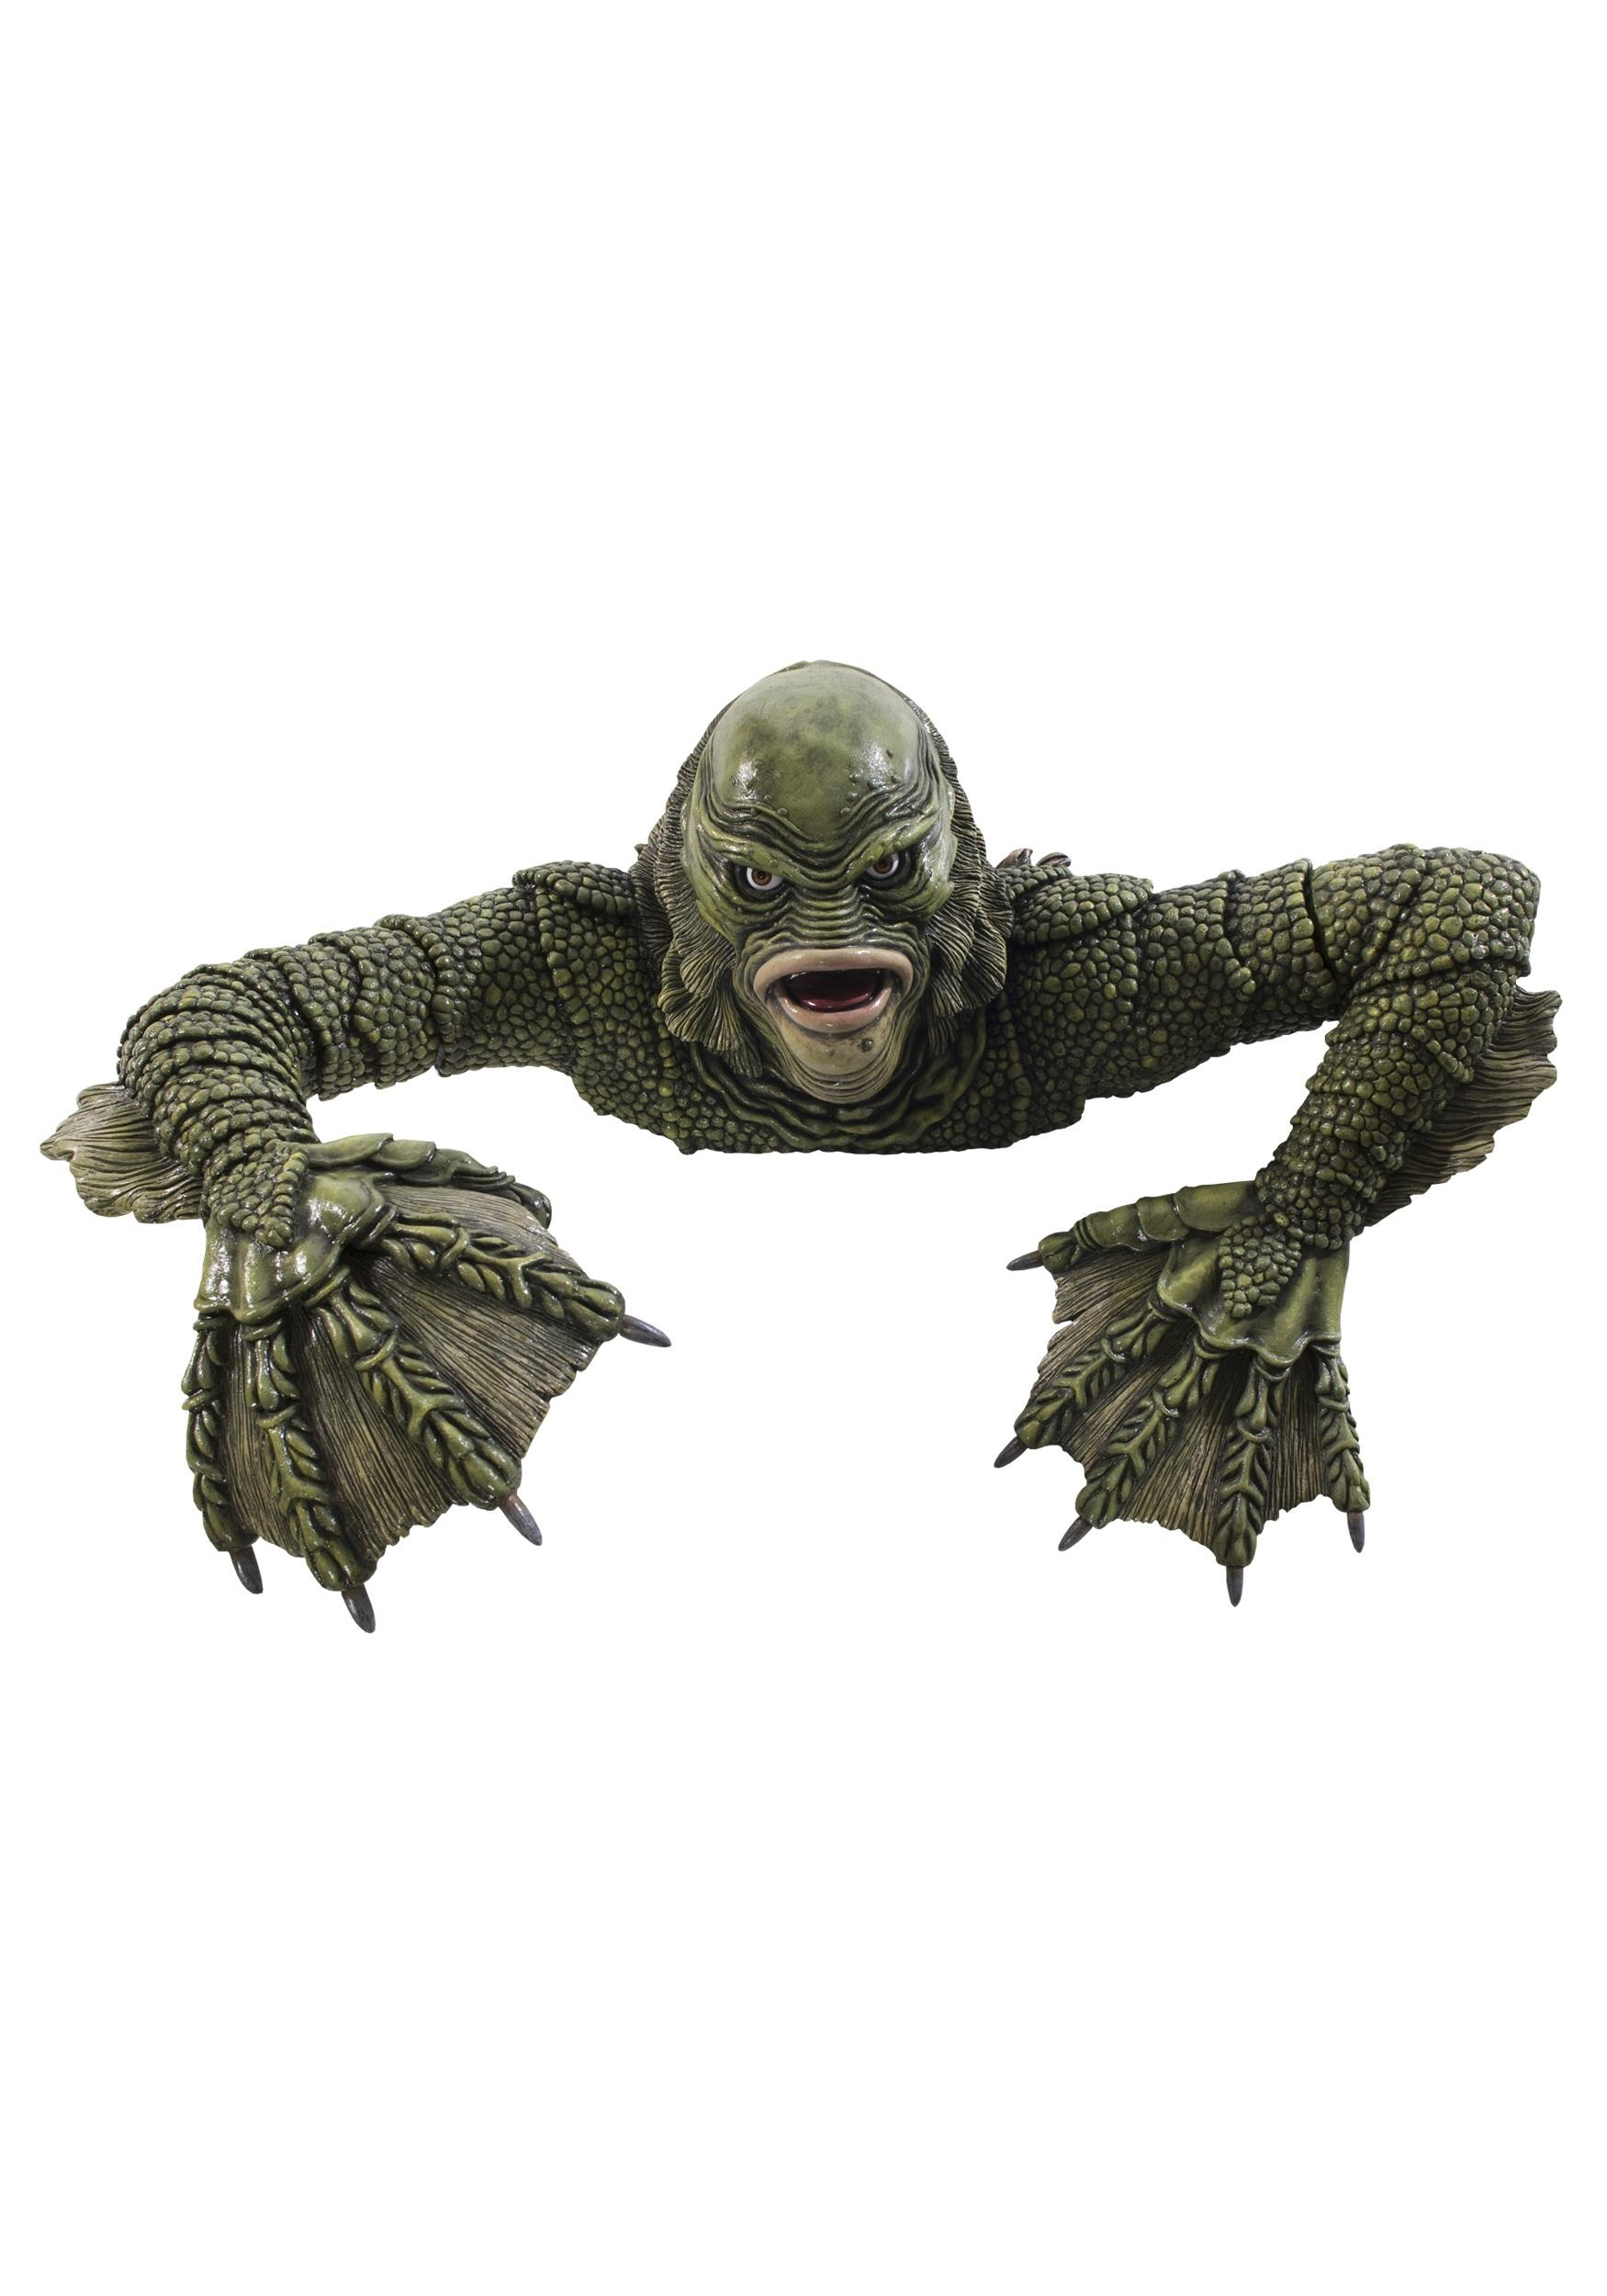 Creature from the Black Lagoon RU68379